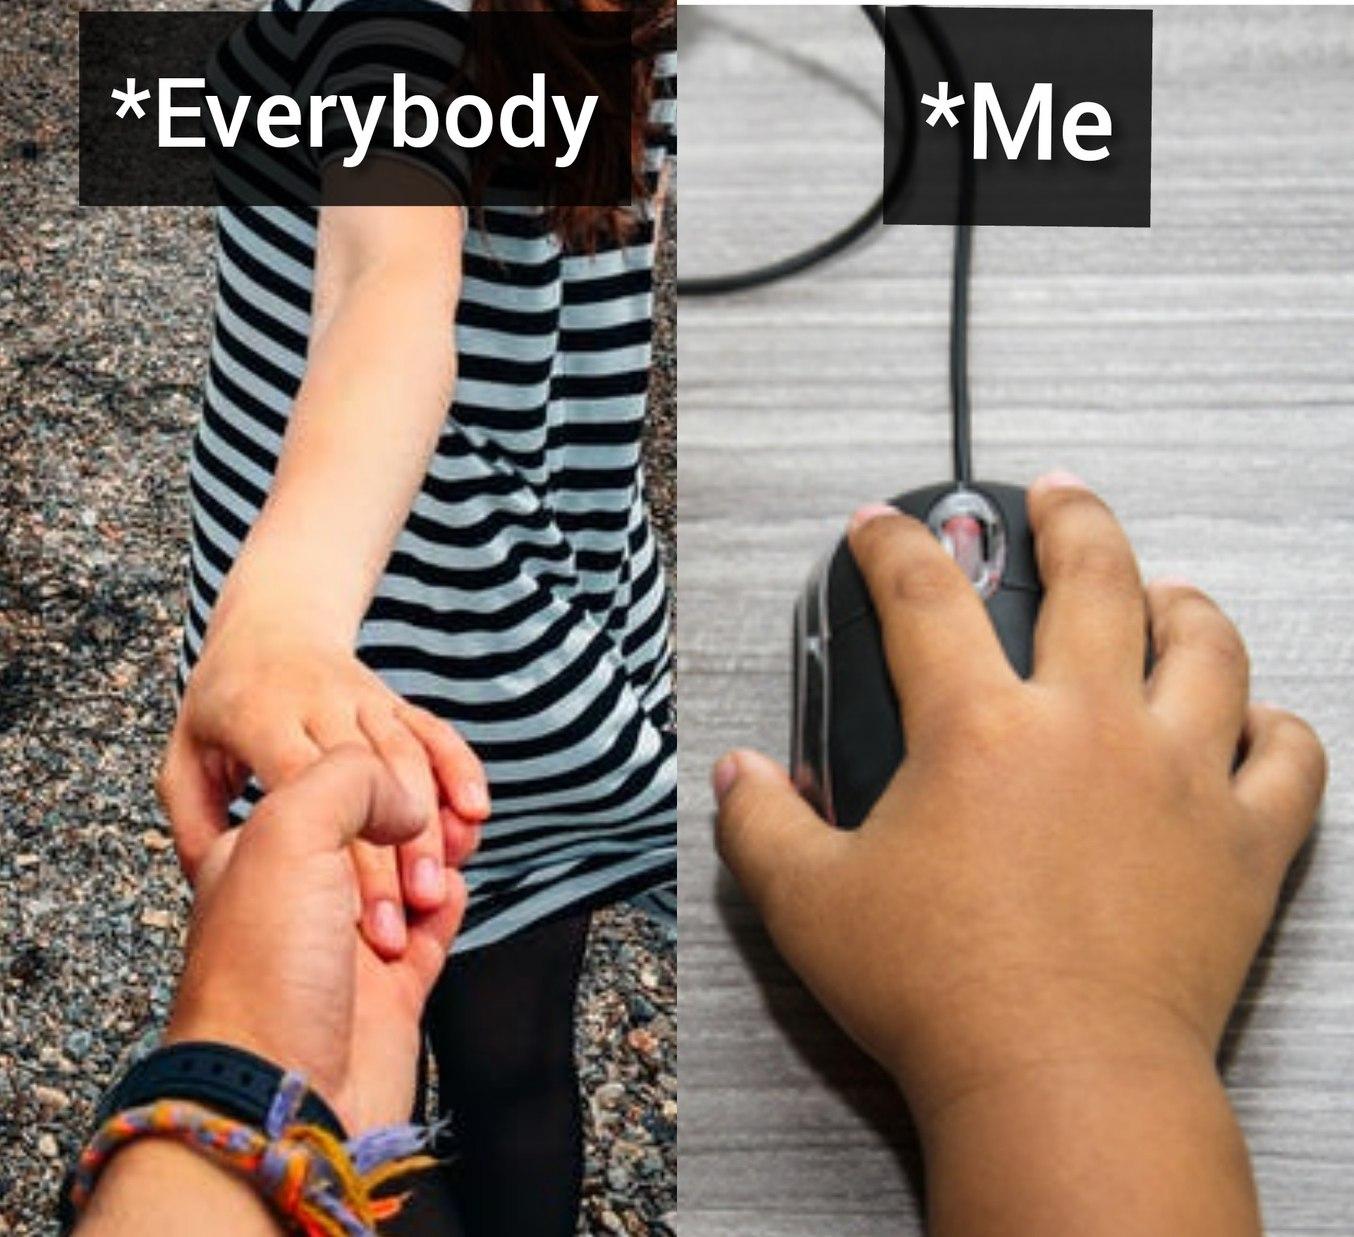 Everybody vs Single Me - meme